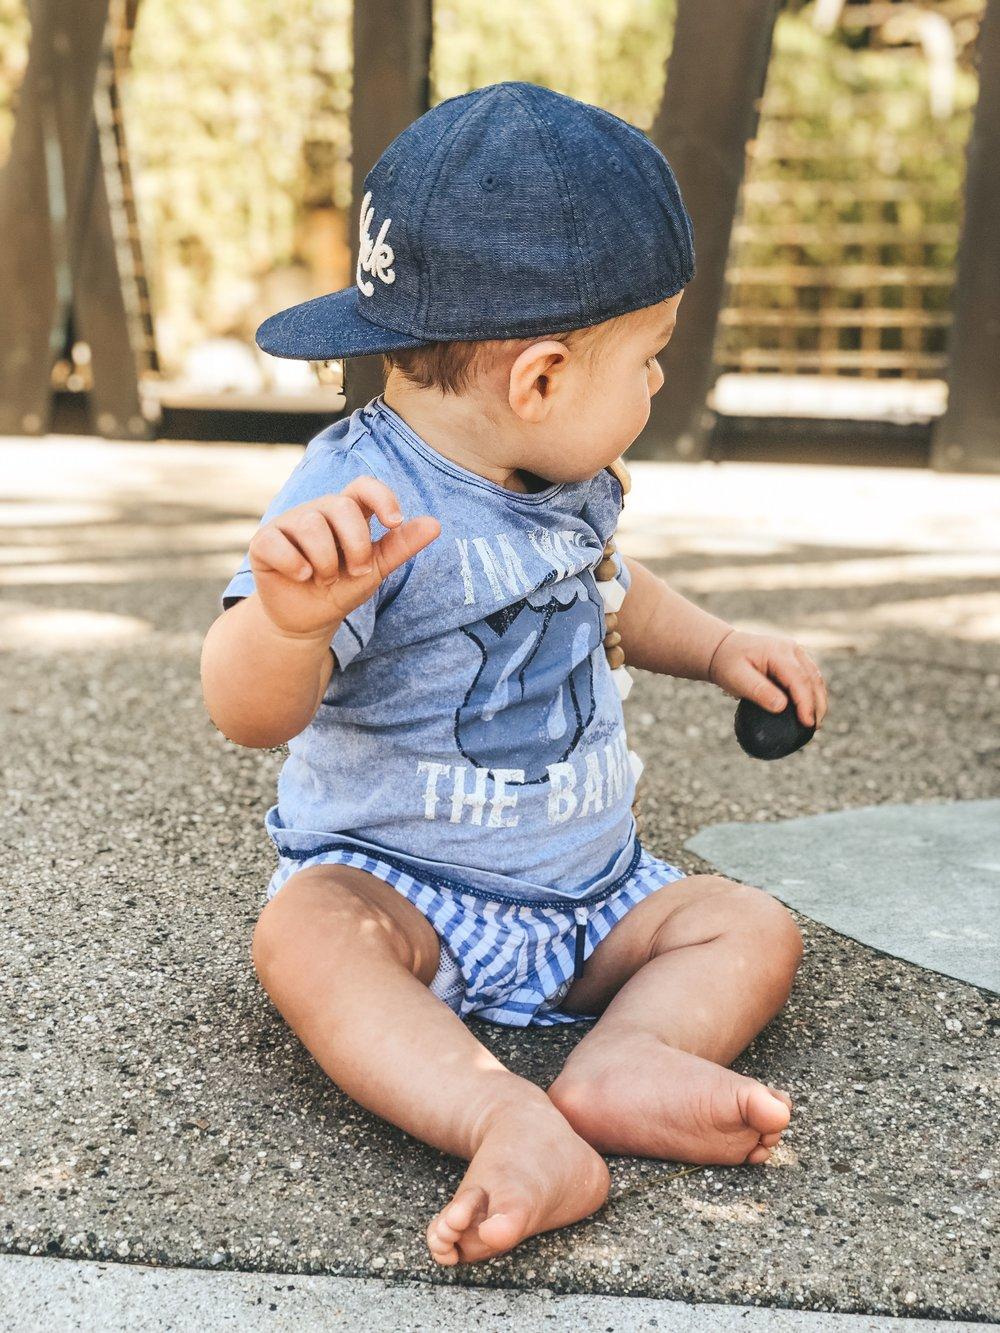 Jett Jones 11 Month Milestones.  Baby boy beach outfit.  Cute baby boy style.